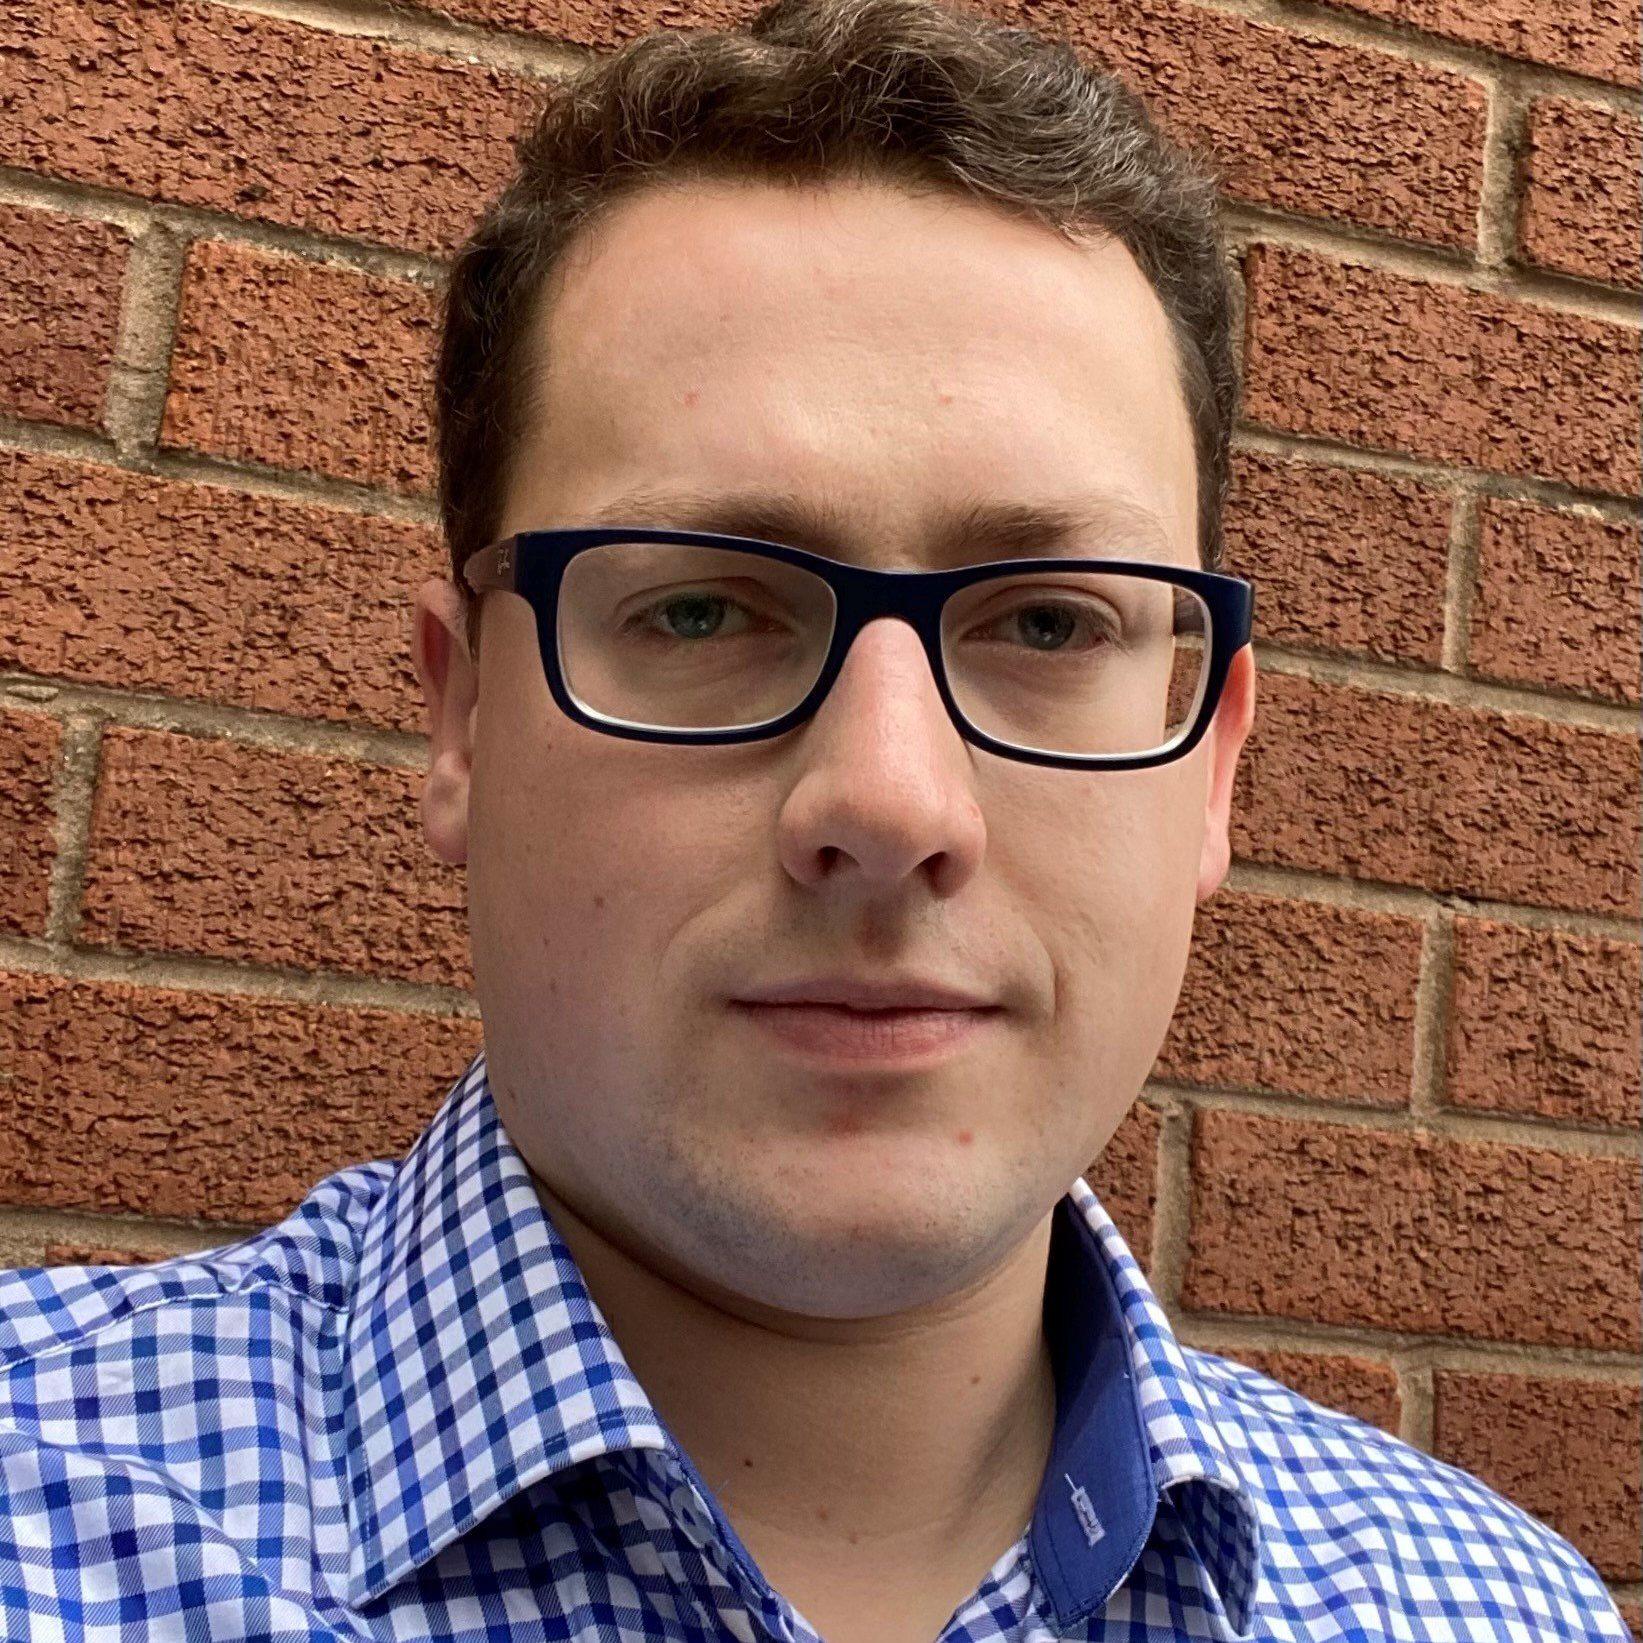 Photograph of Mark Ashton